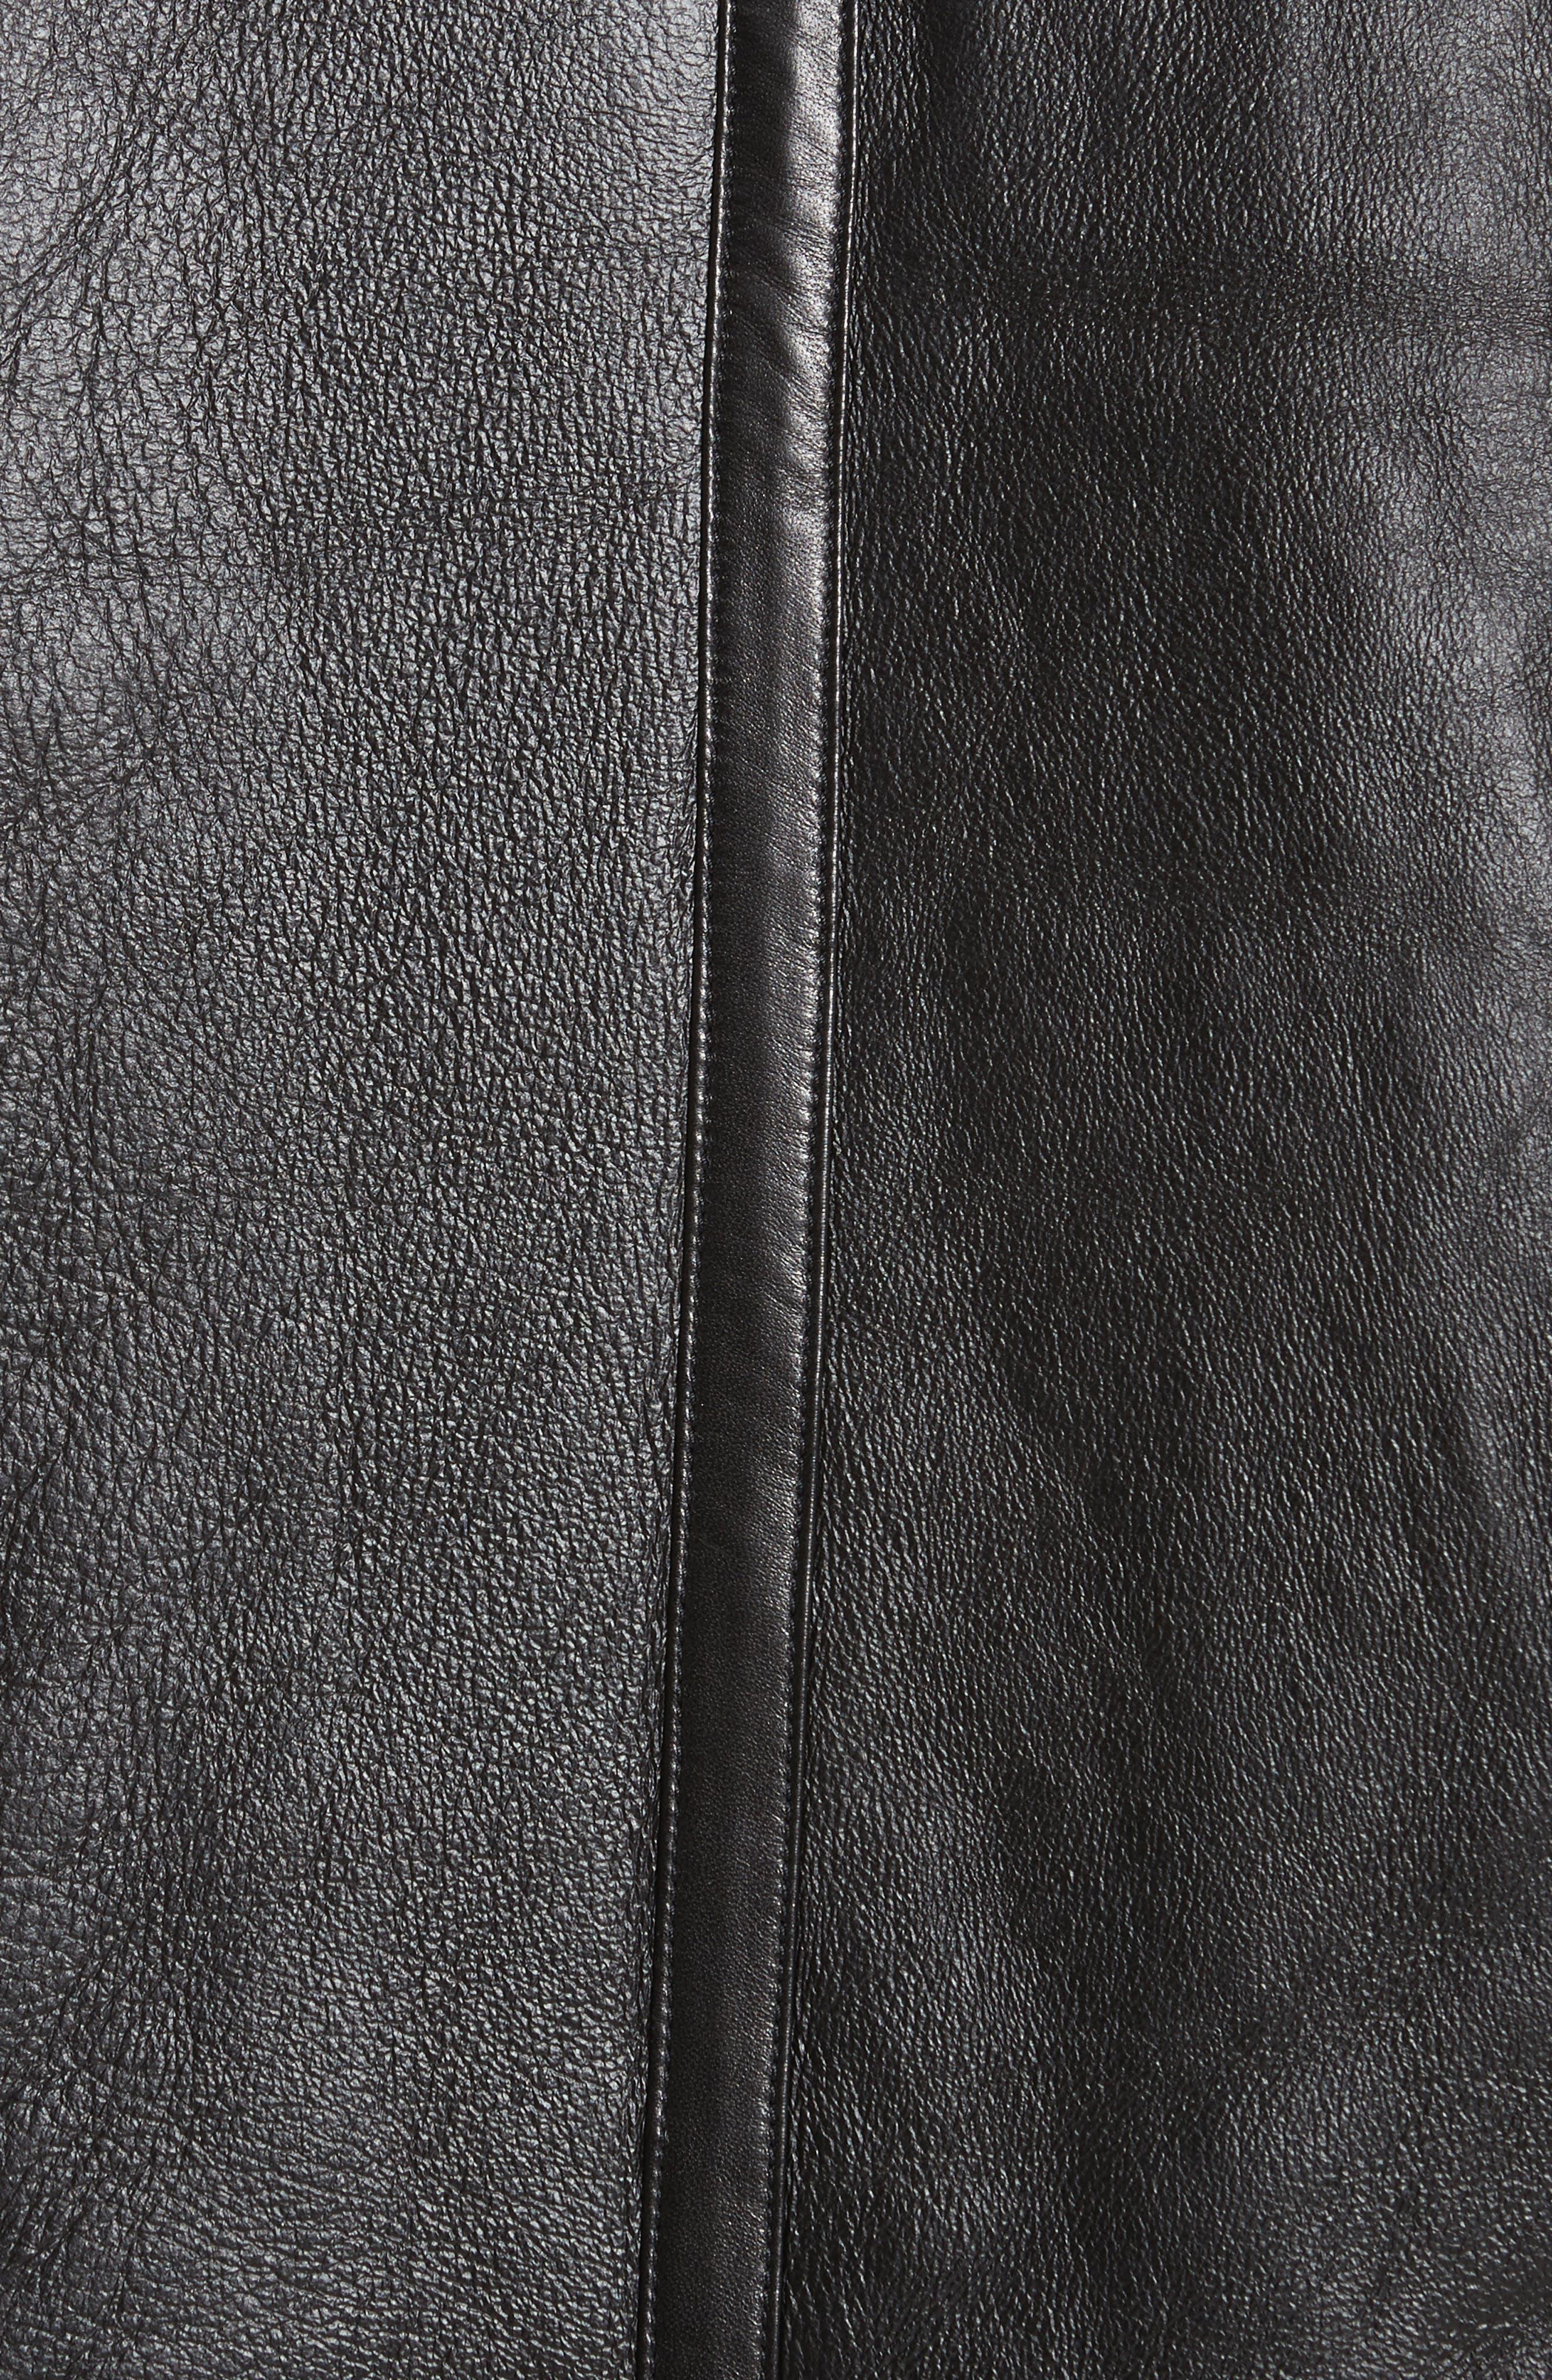 Genuine Shearling Jacket,                             Alternate thumbnail 6, color,                             001